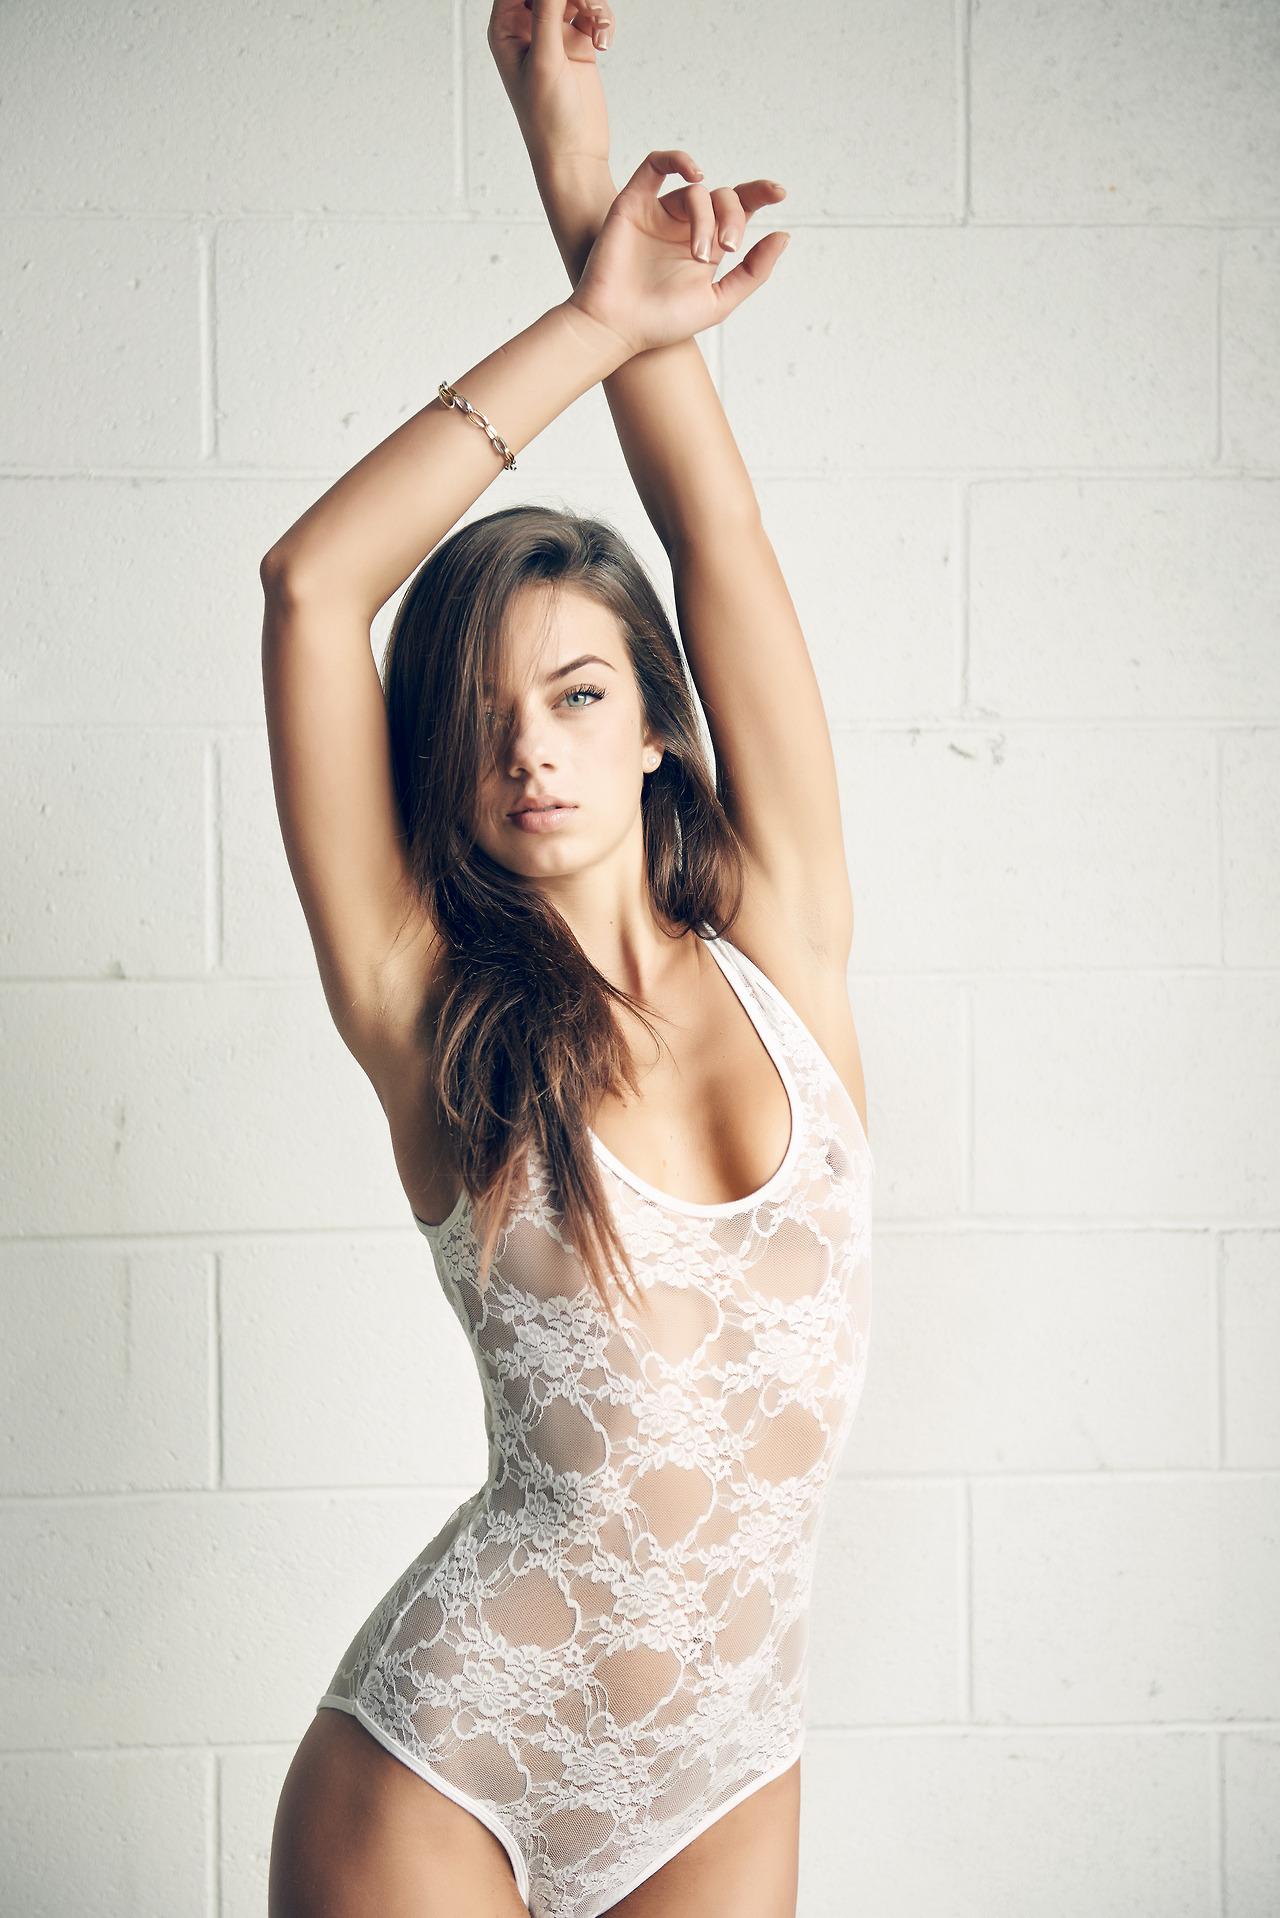 30 Most Beautiful California Instagram Models